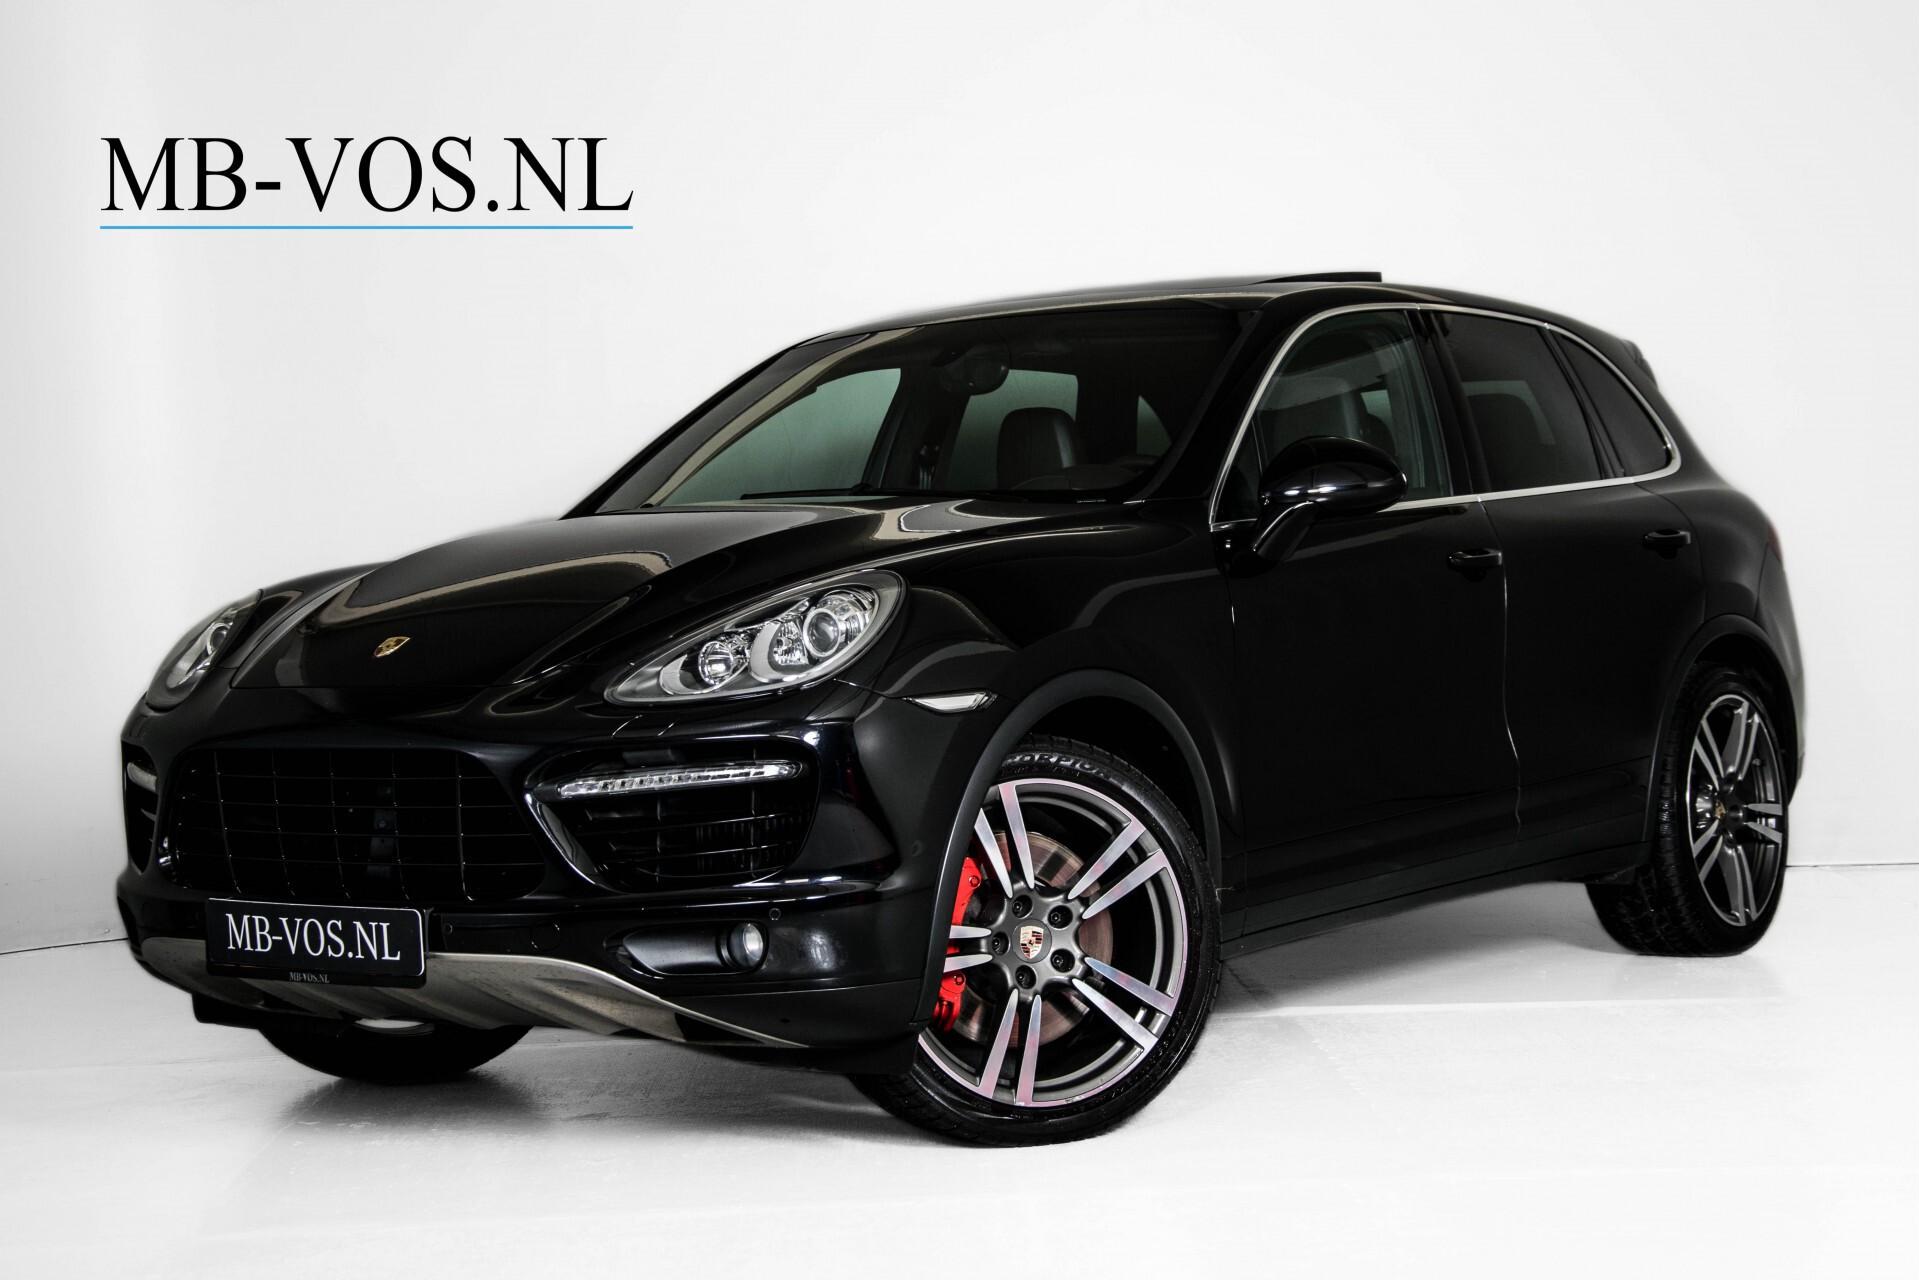 Porsche Cayenne 4.8 Turbo Exclusive/Panorama/Bose/21''/Sportstoelen Aut8 Foto 1